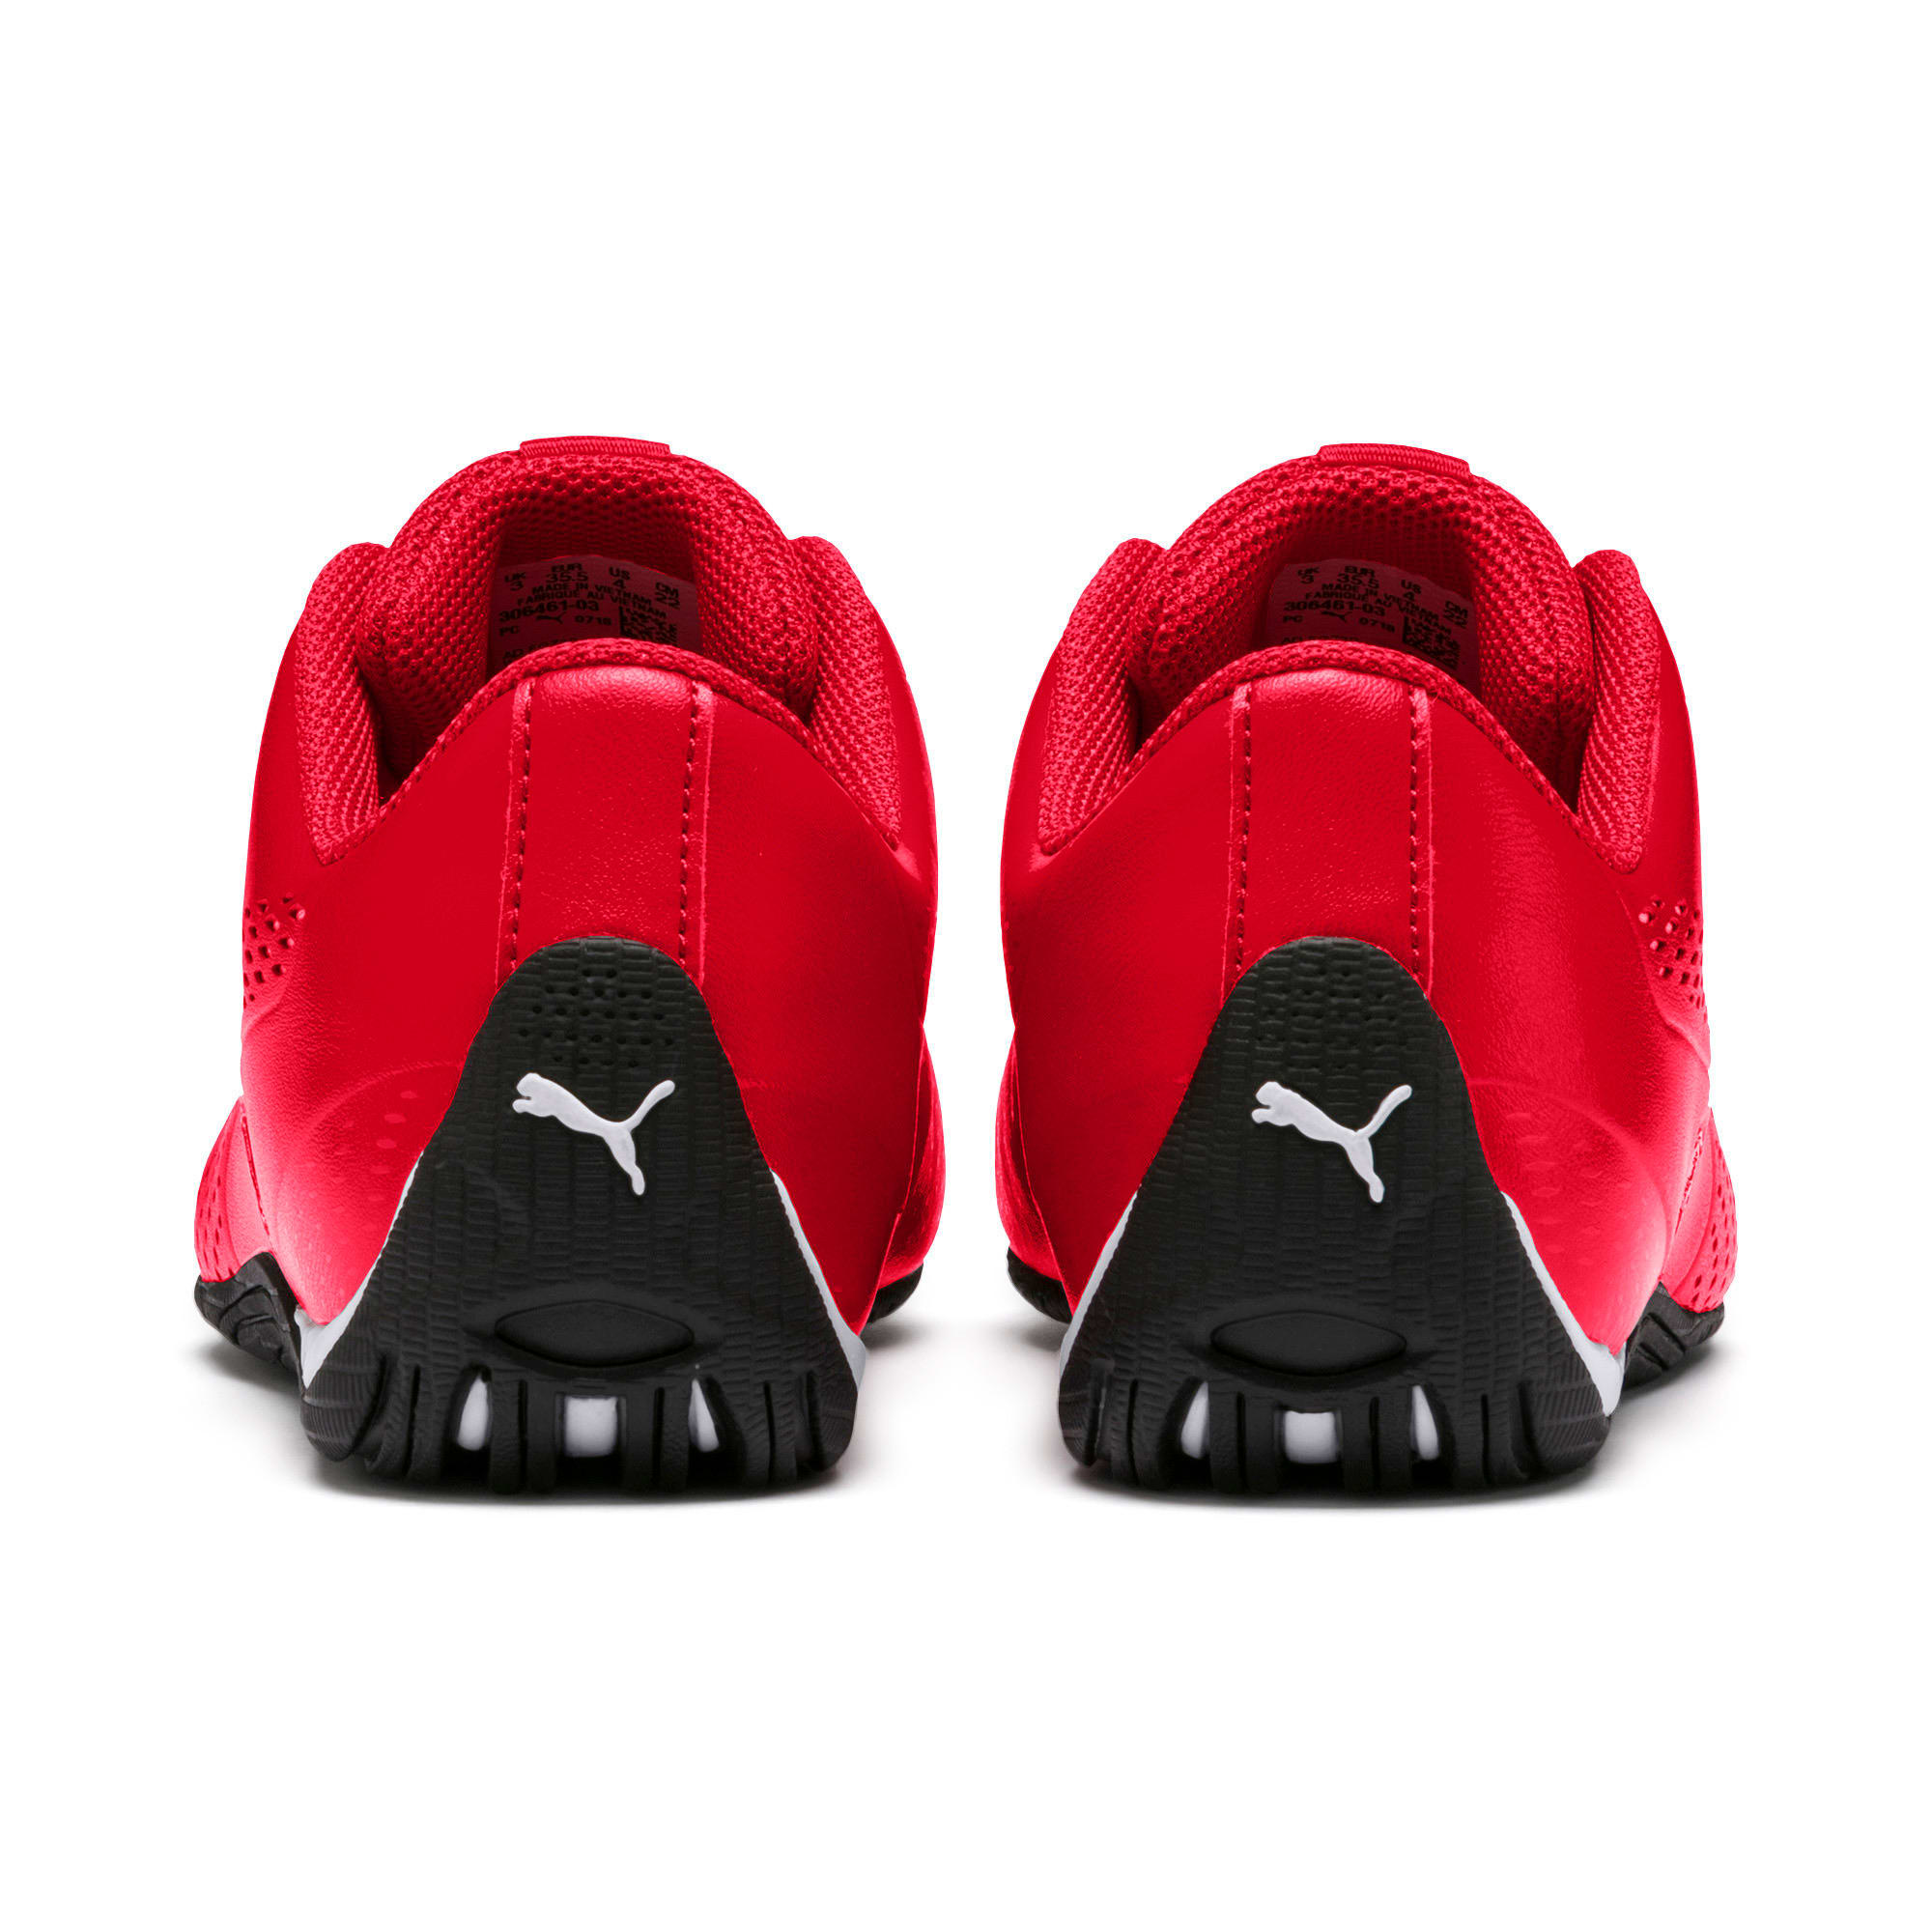 Thumbnail 3 of Scuderia Ferrari Drift Cat 5 Ultra II Shoes JR, Rosso Corsa-Puma White, medium